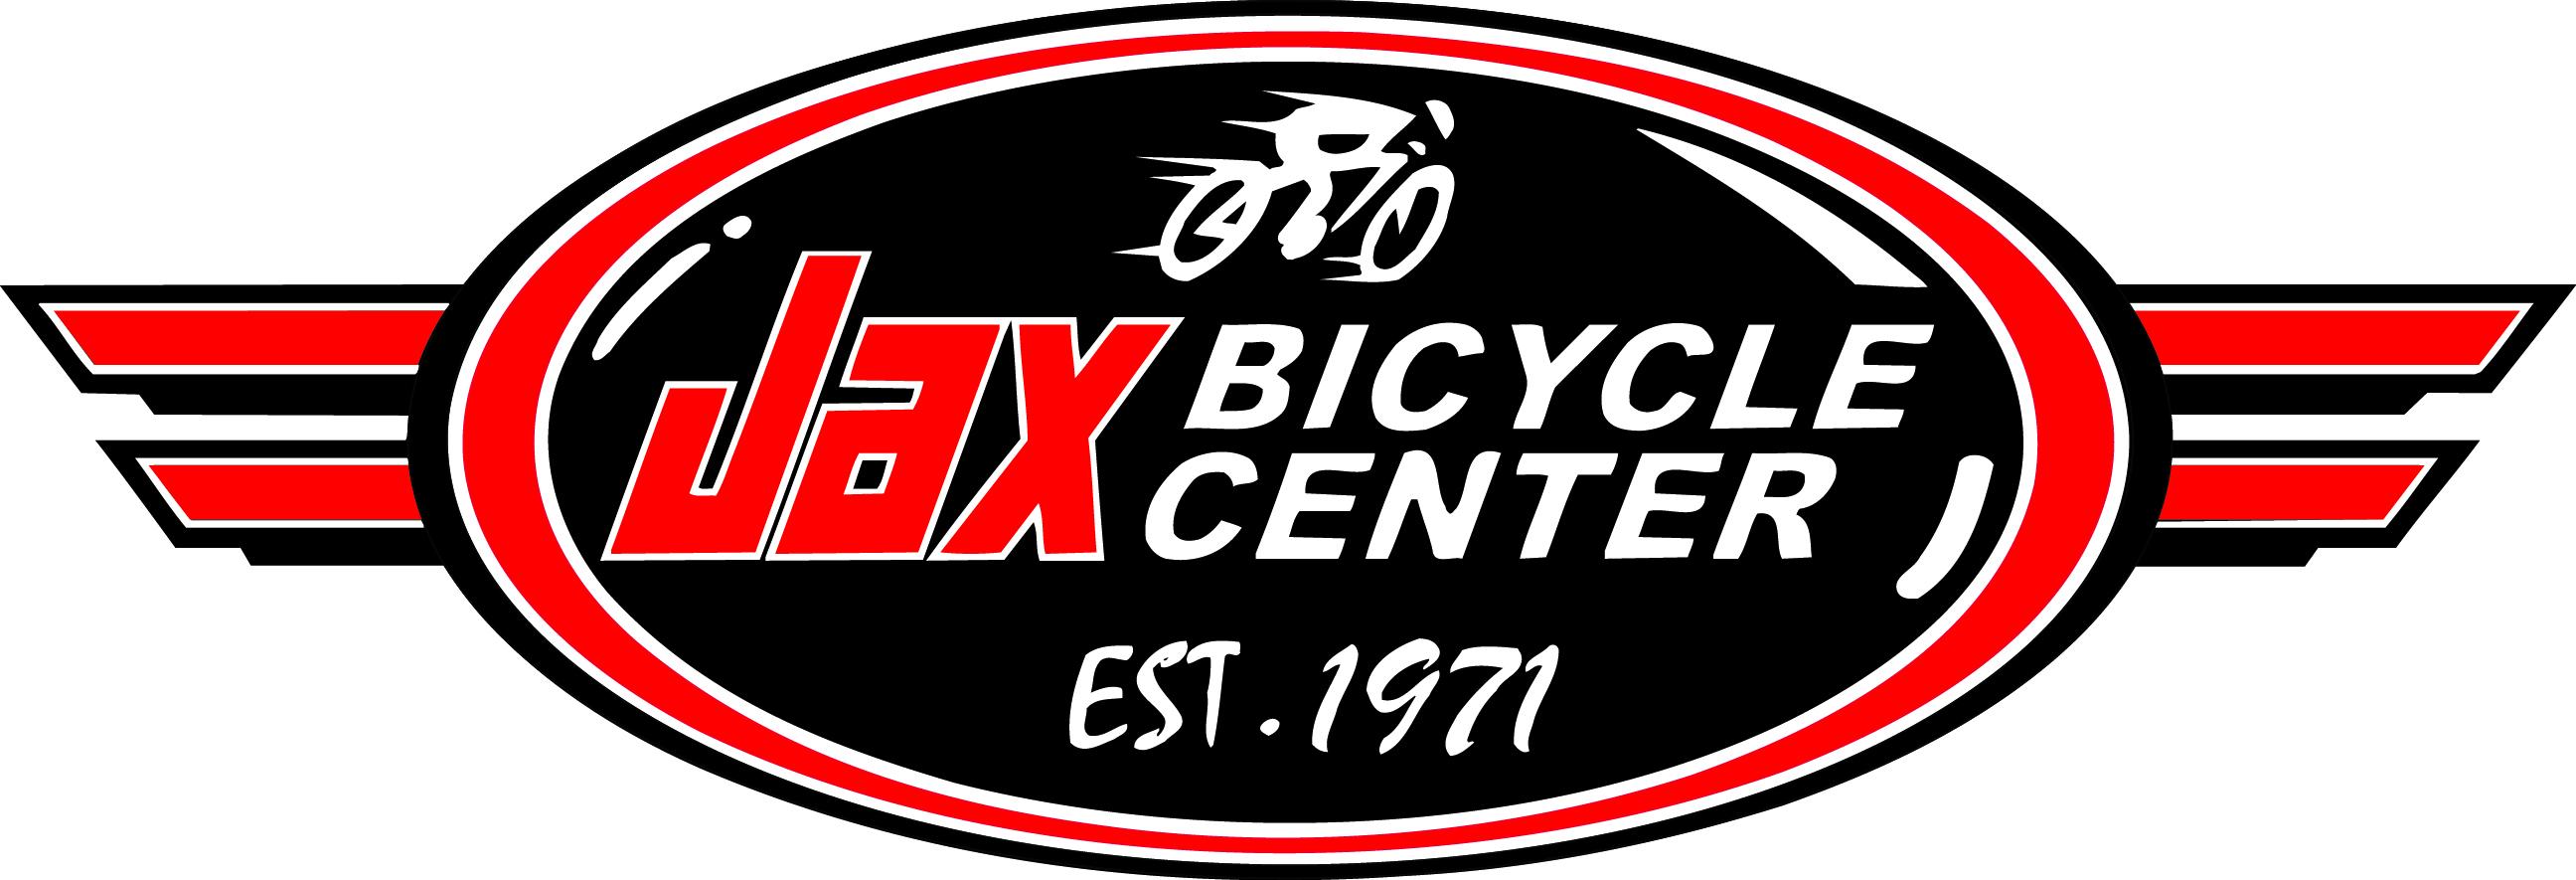 Jax bike shops in Orange County